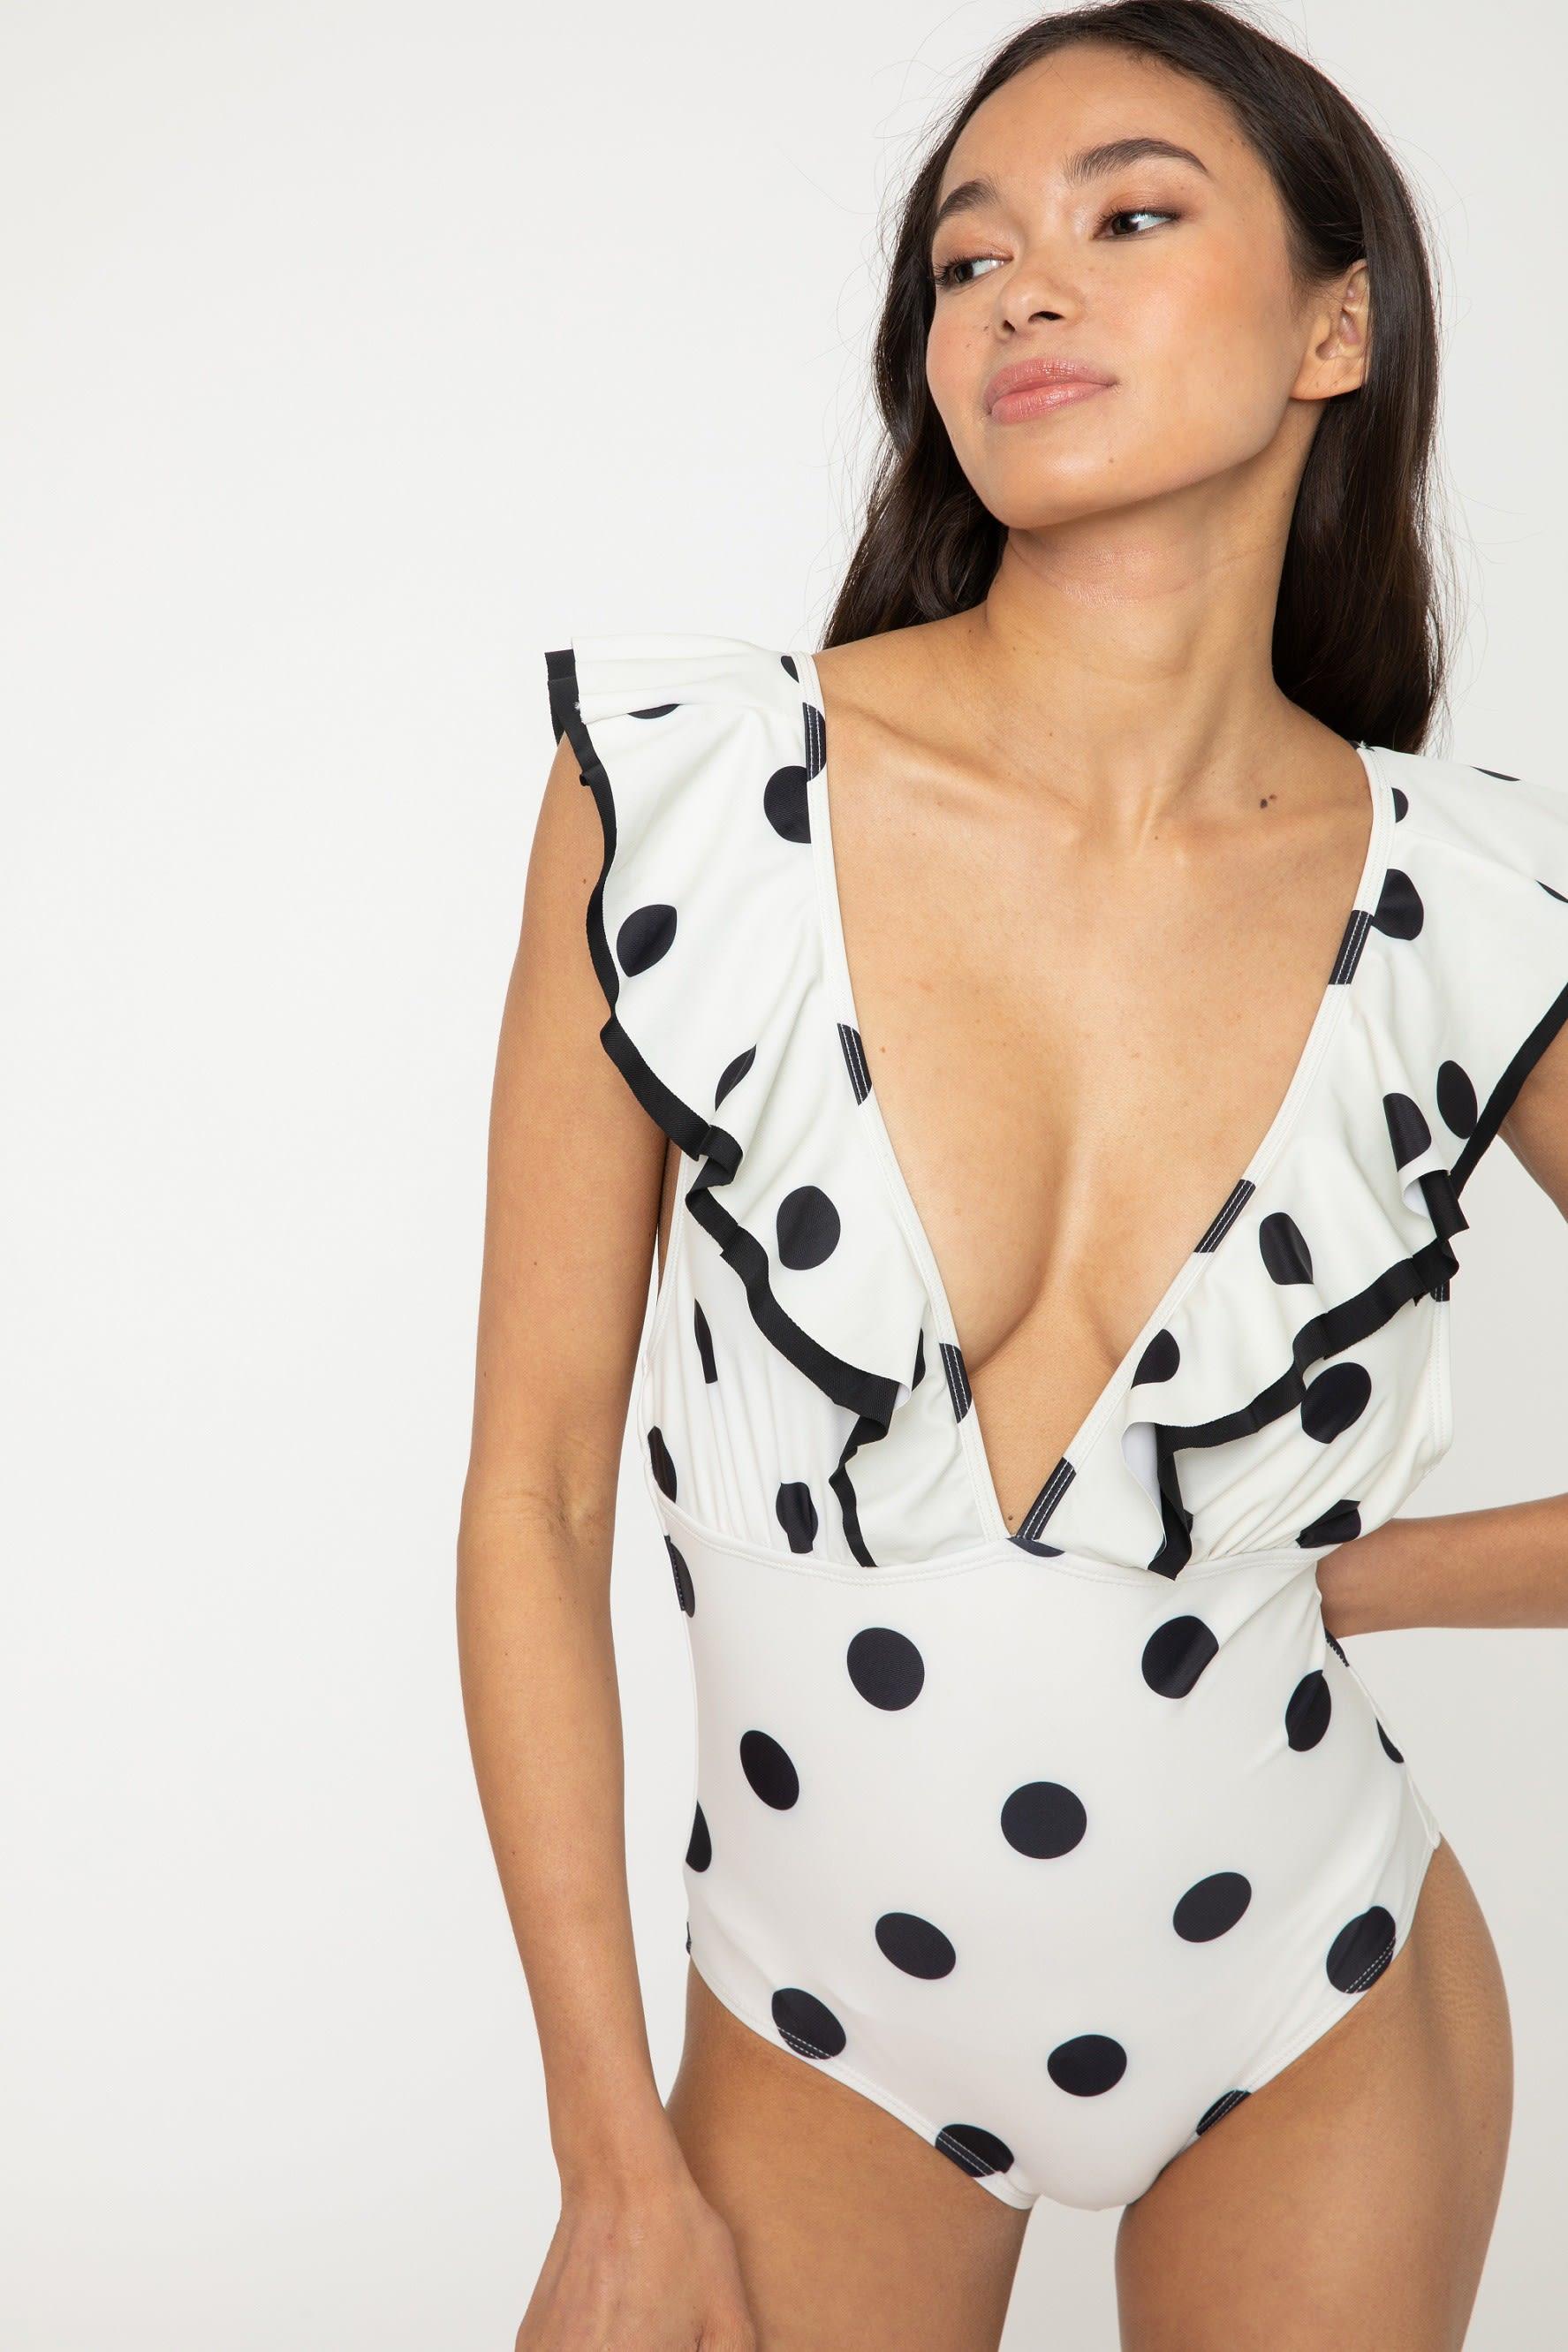 V Neck Double Ruffle Trim Swimsuit - White/ Black - Front